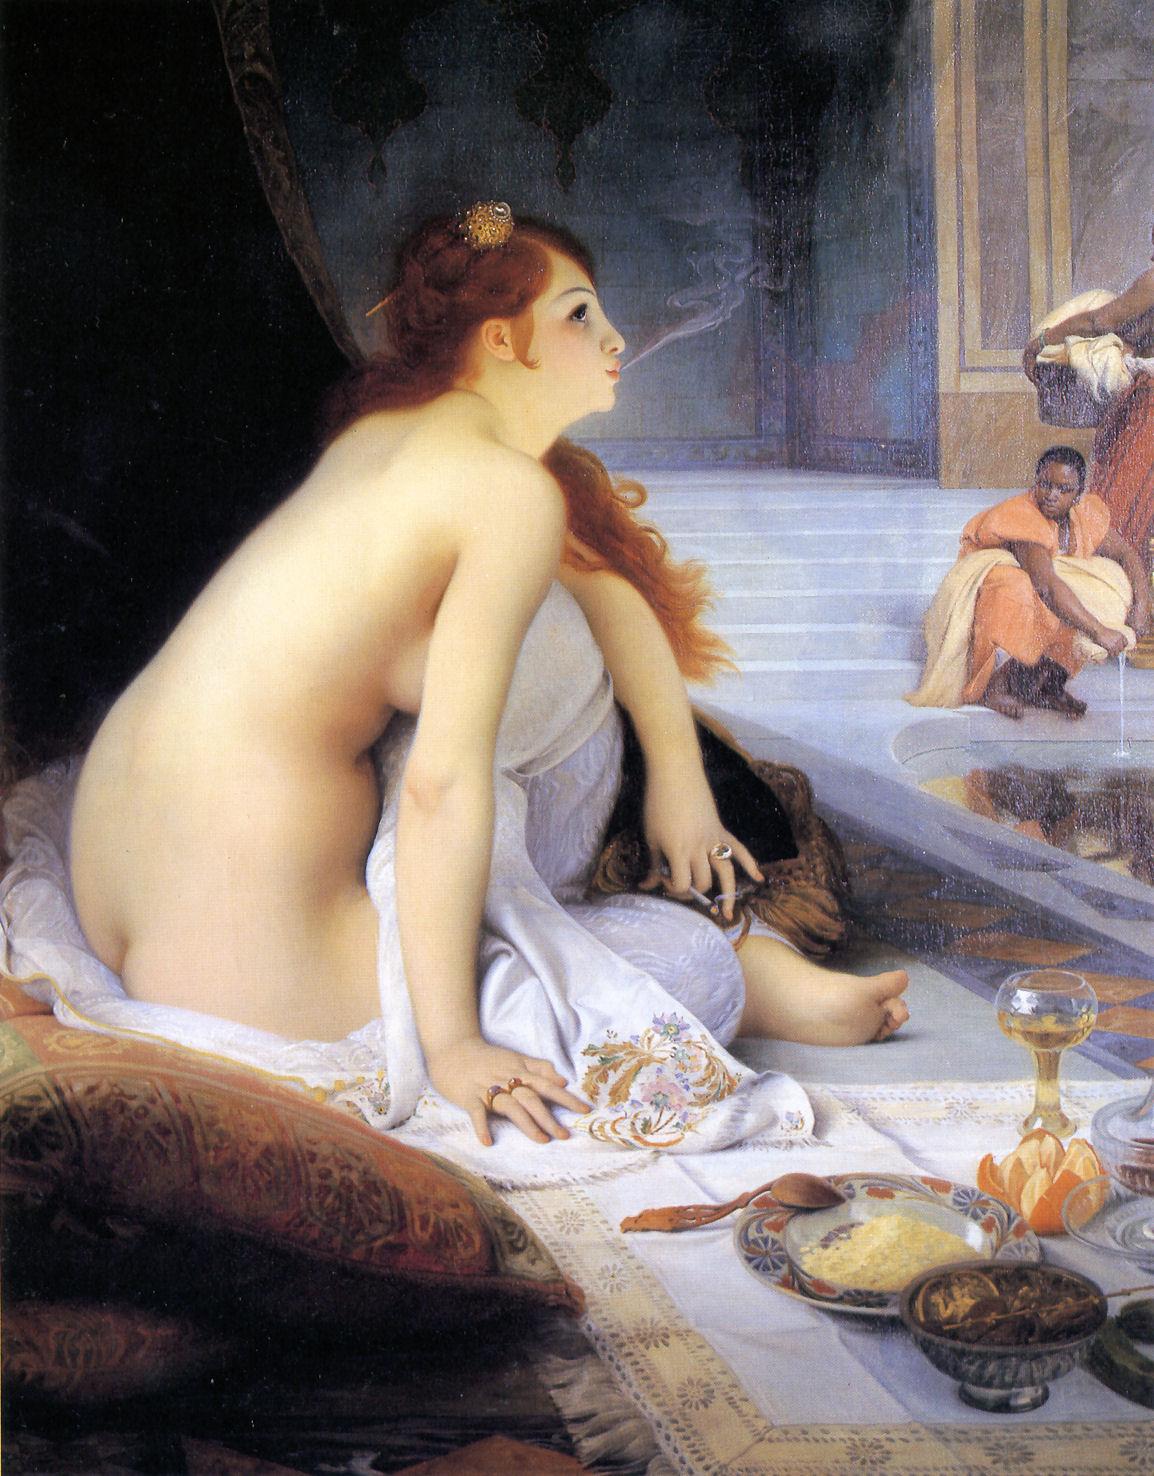 http://3.bp.blogspot.com/_Nuta_CQvImI/TGKX7-snDLI/AAAAAAAACrE/oEuTJrlfgiA/s1600/Jean-Lecomte-du-Nouy,-The-White-Slave,-1888.jpg